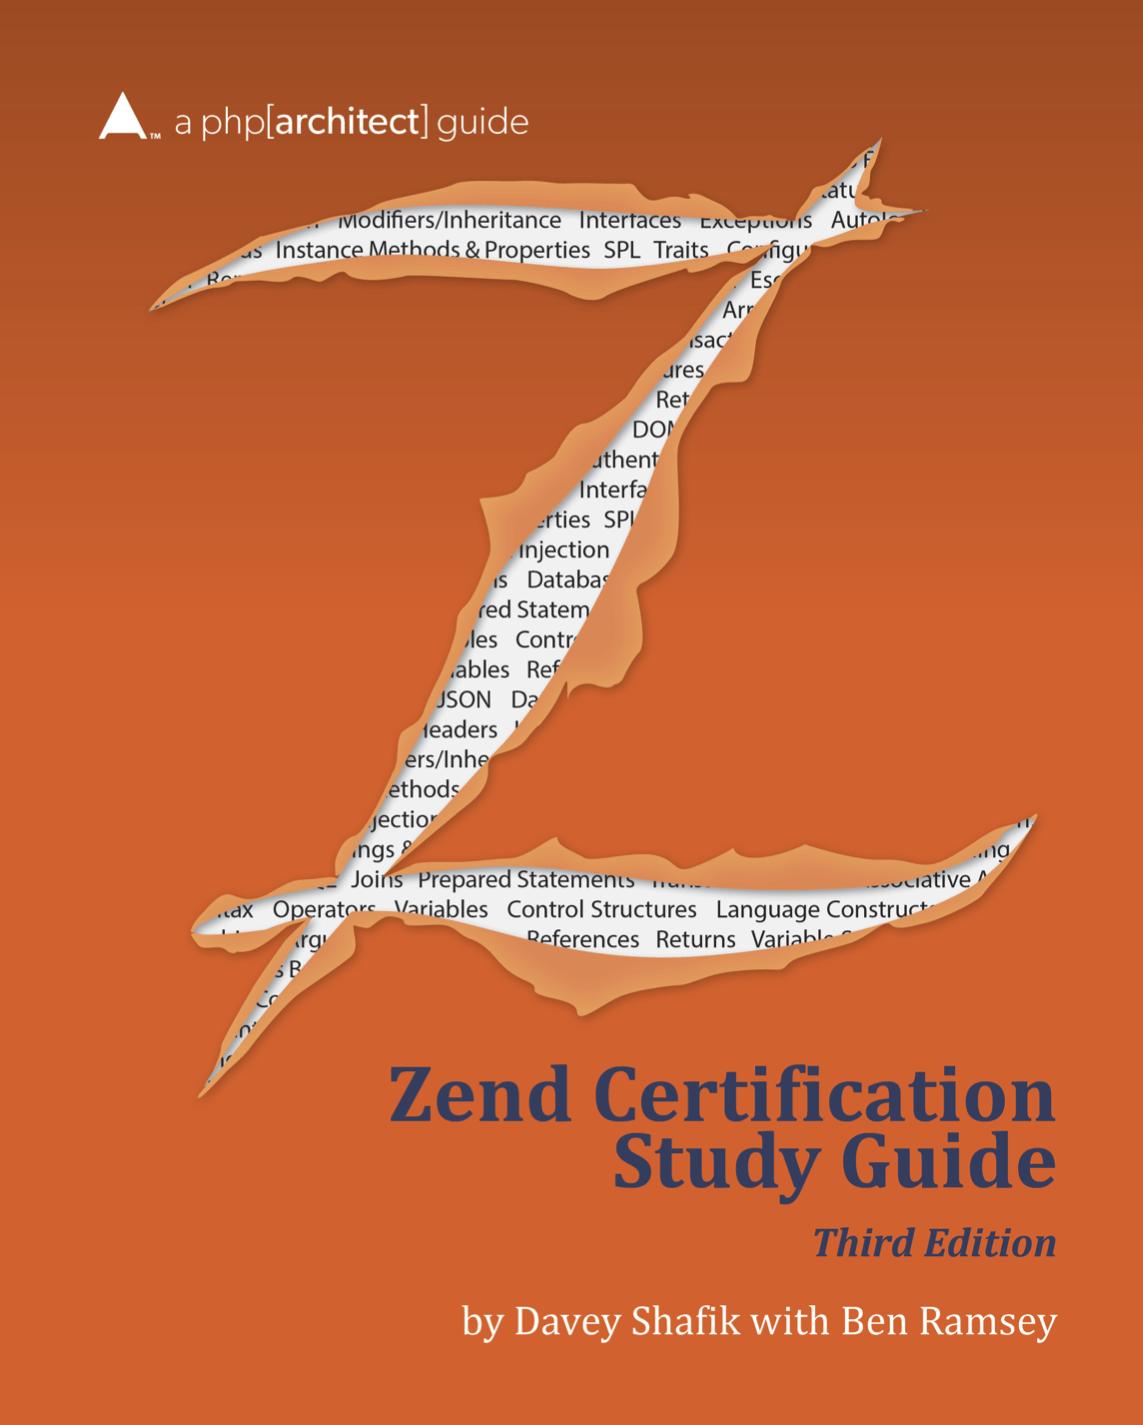 Zend Certification Study Guide